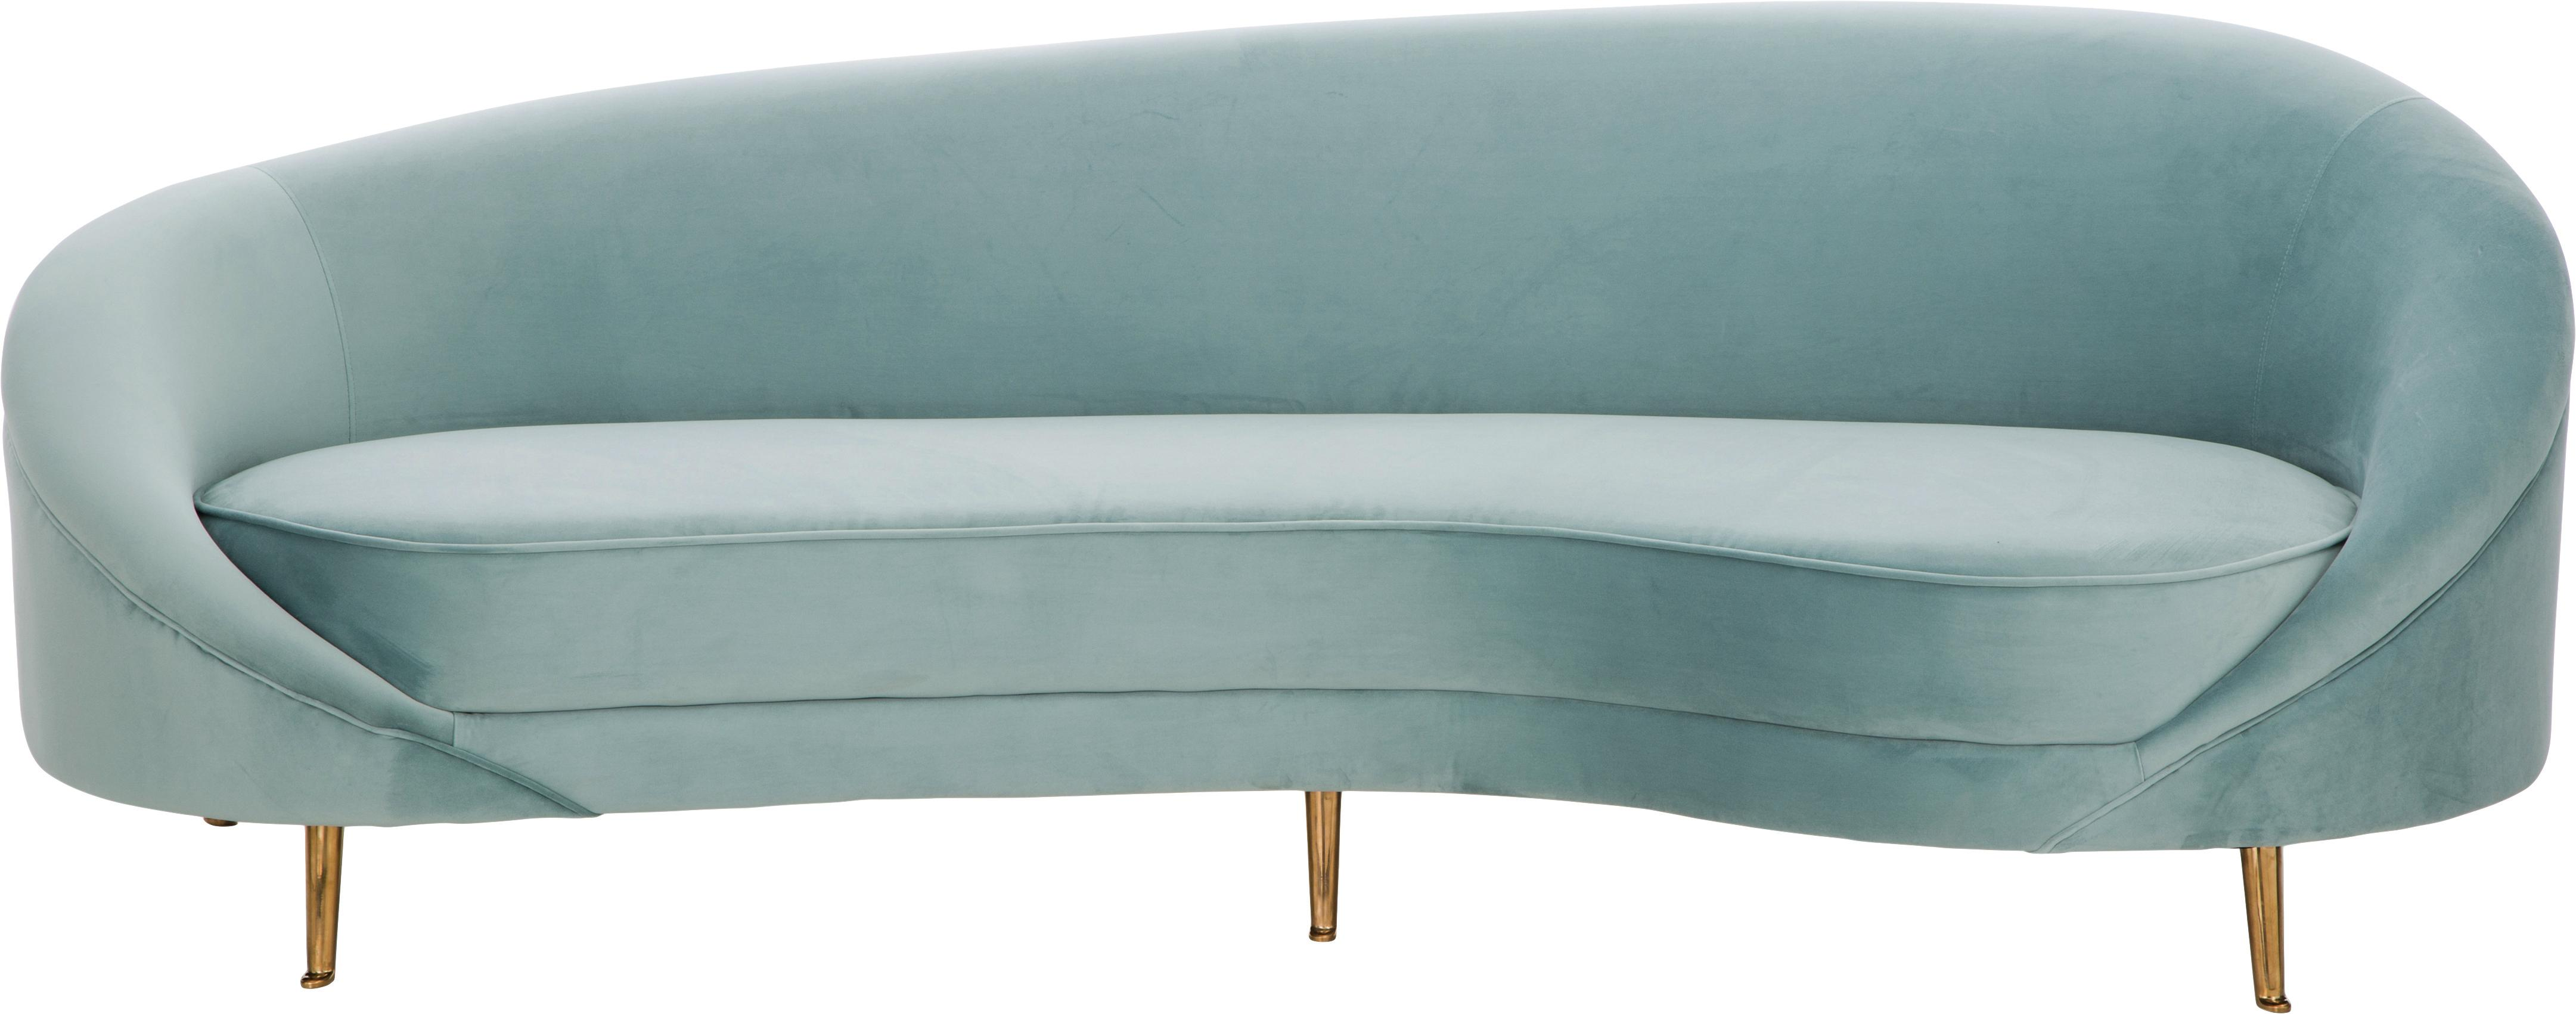 Samt-Nierensofa Gatsby (3-Sitzer), Bezug: Samt (Polyester) 25.000 S, Gestell: Massives Eukalyptusholz, Füße: Metall, galvanisiert, Samt Türkis, B 245 x T 102 cm